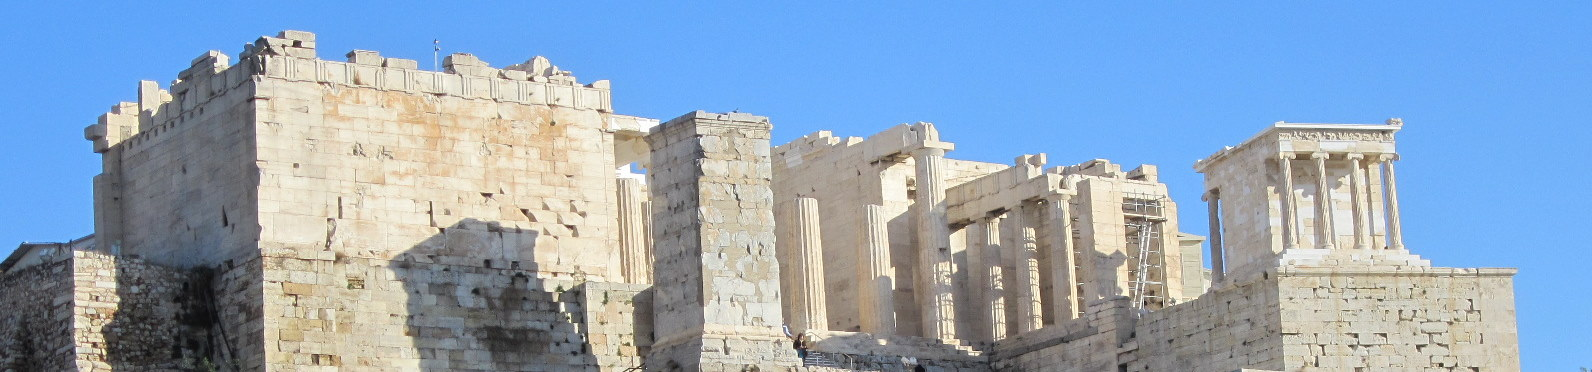 Vacances en Grèce sur mesure